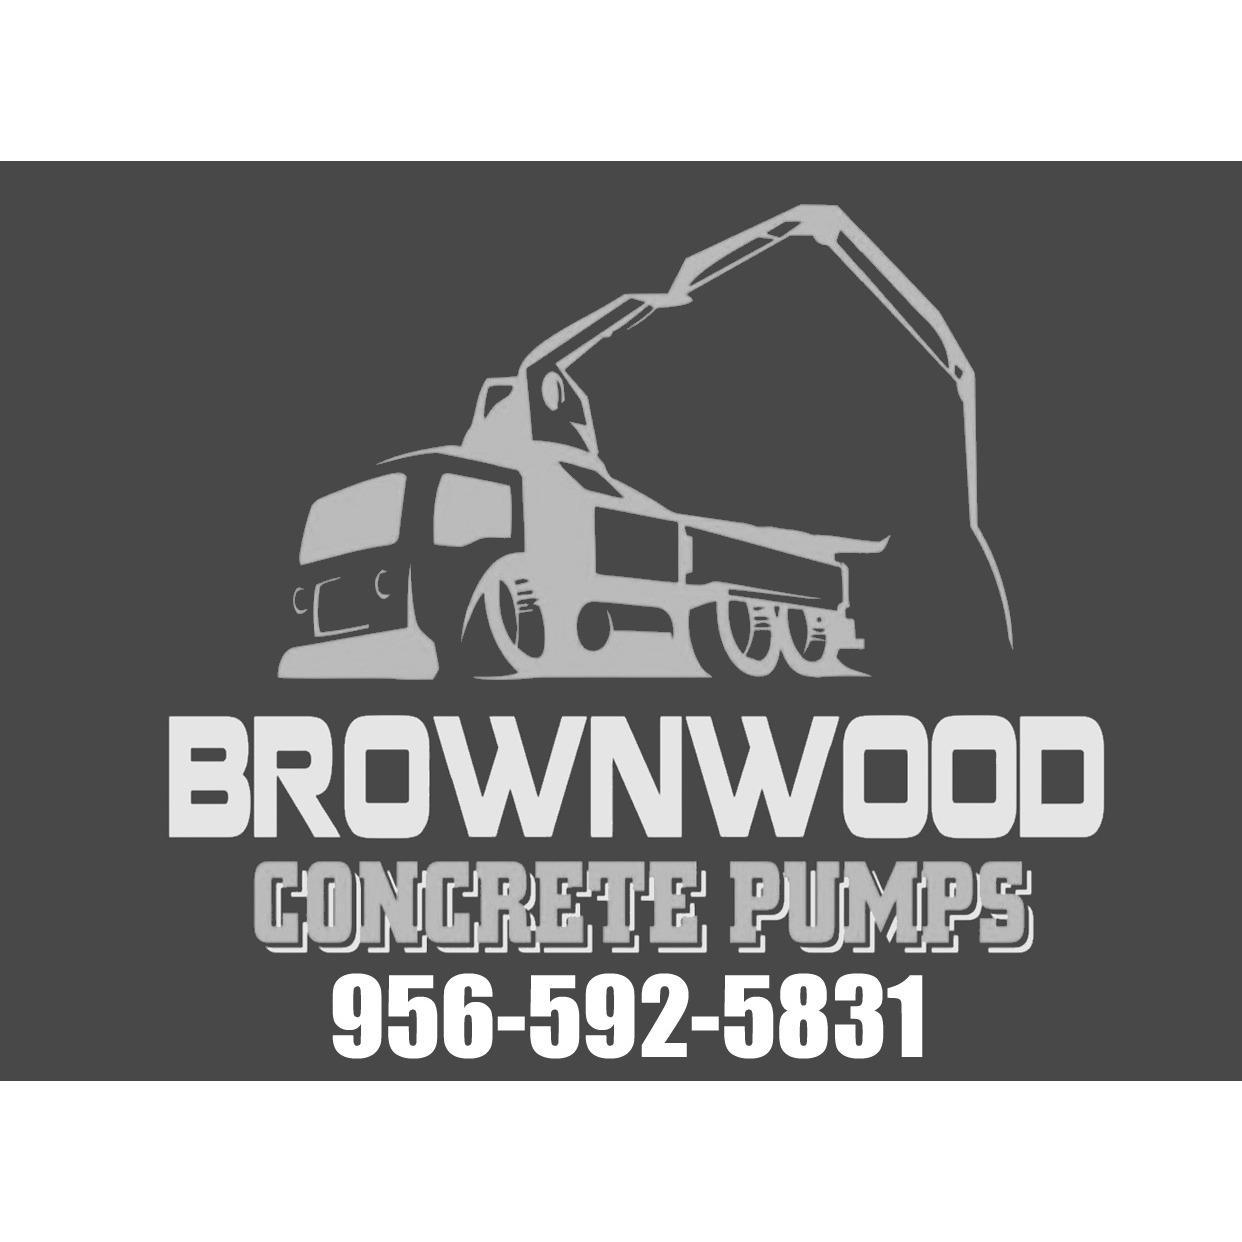 Brownwood Concrete Pumps Logo